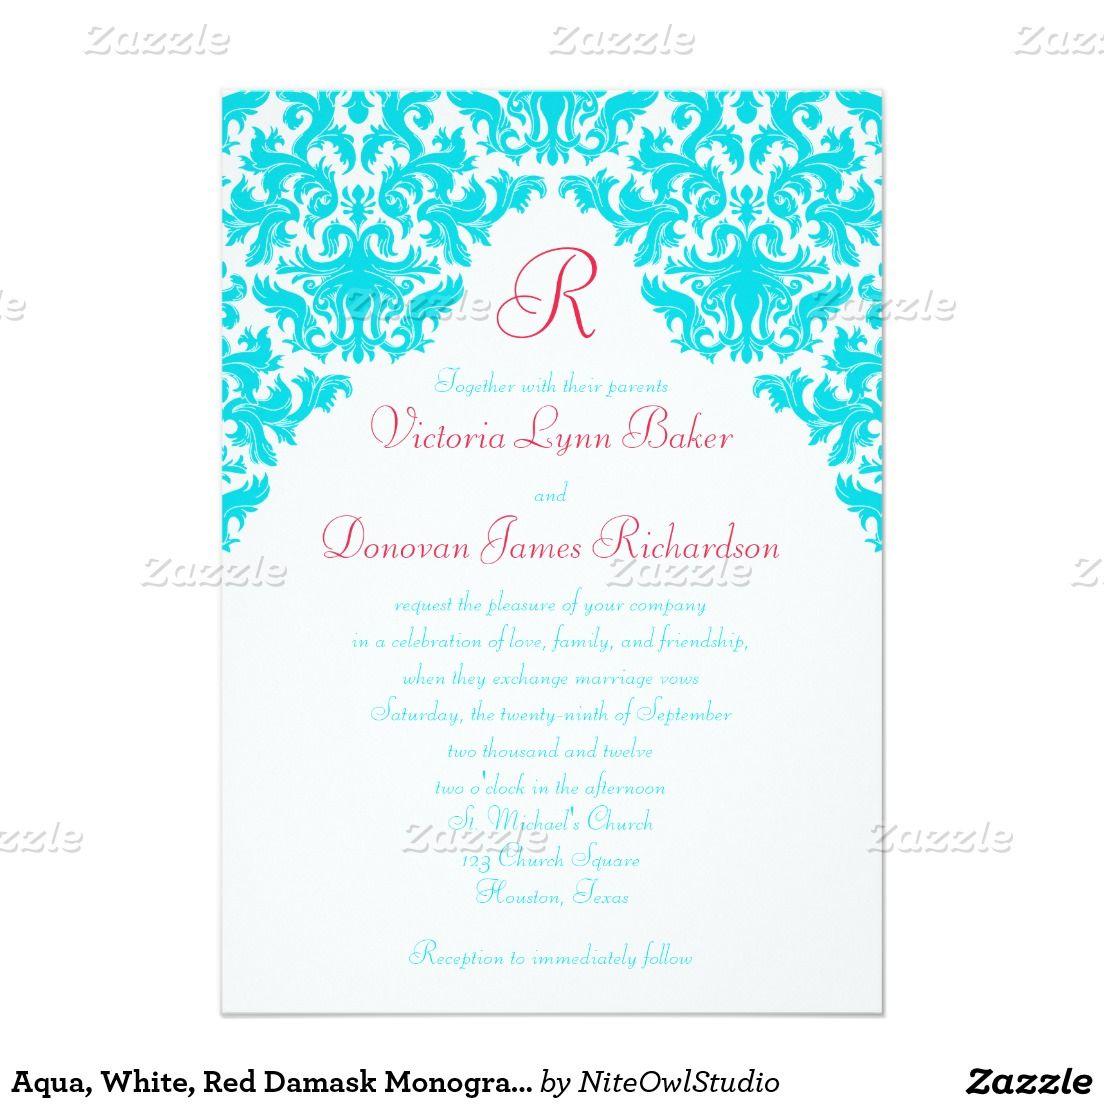 Aqua, White, Red Damask Monogrammed Invite | Damasks, Aqua and Red